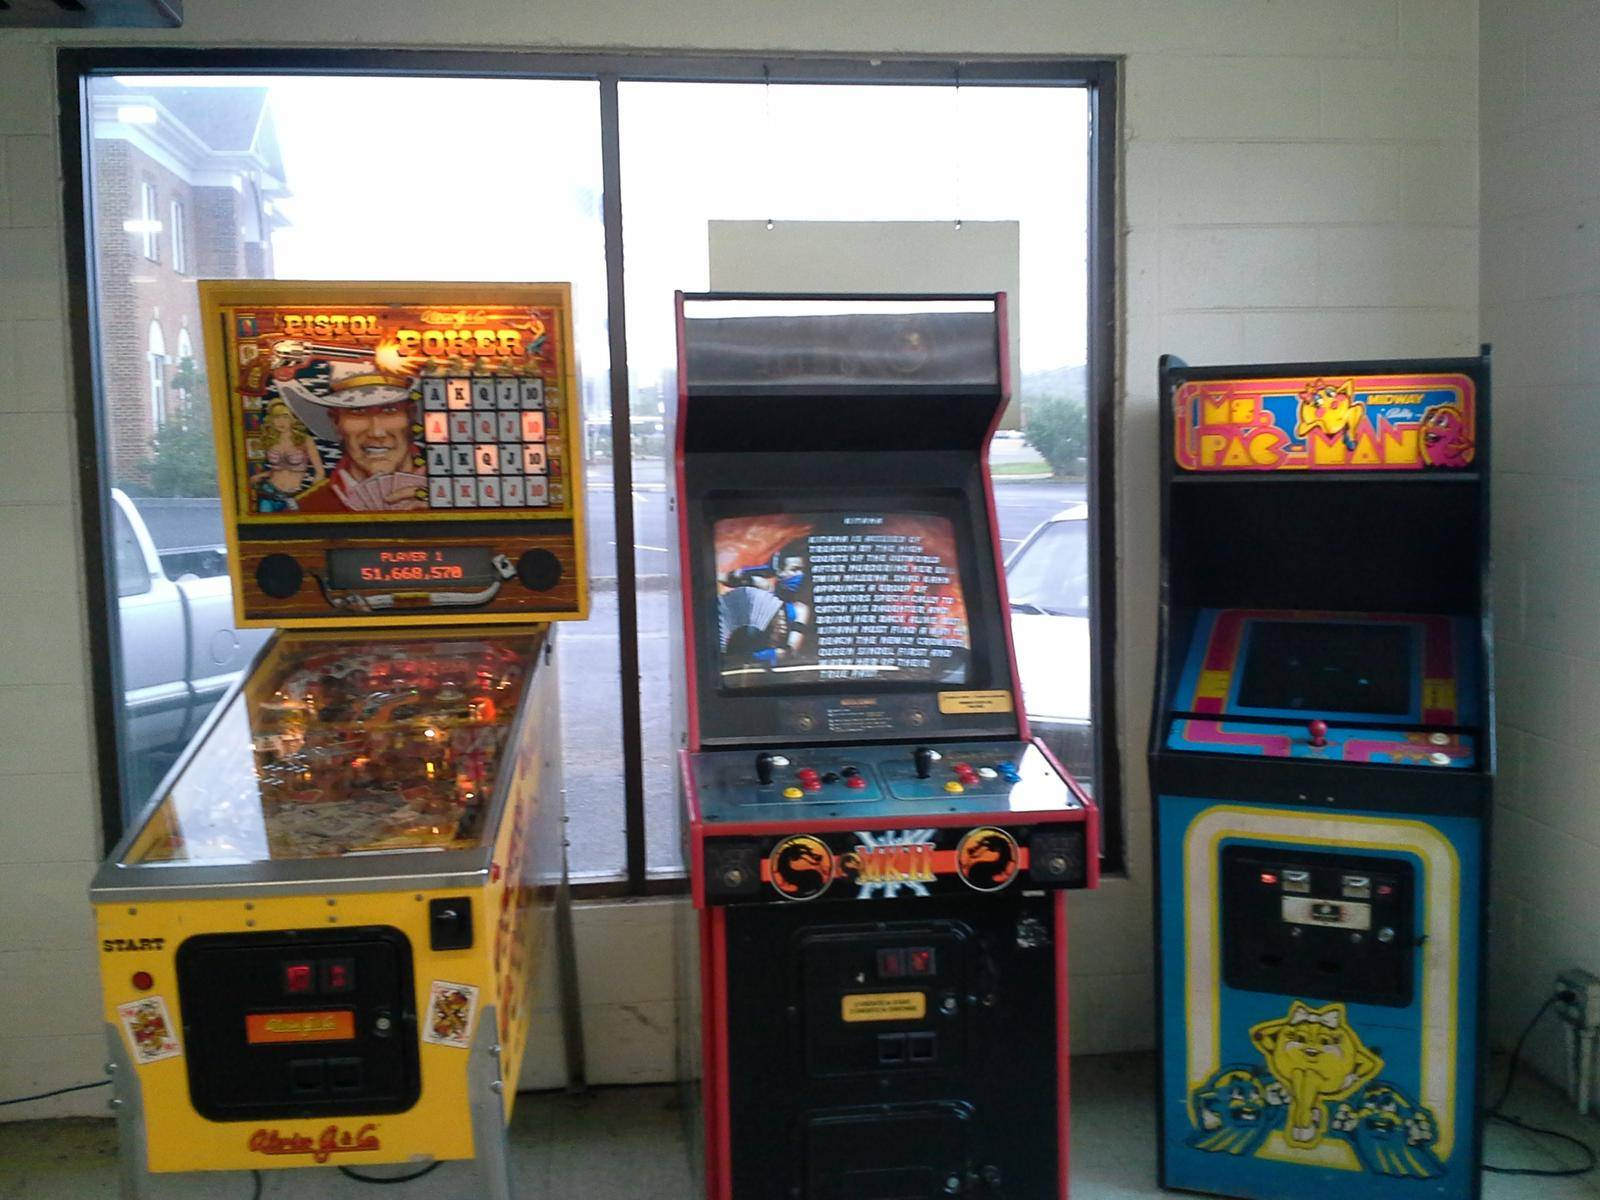 Tailgate party slot machine